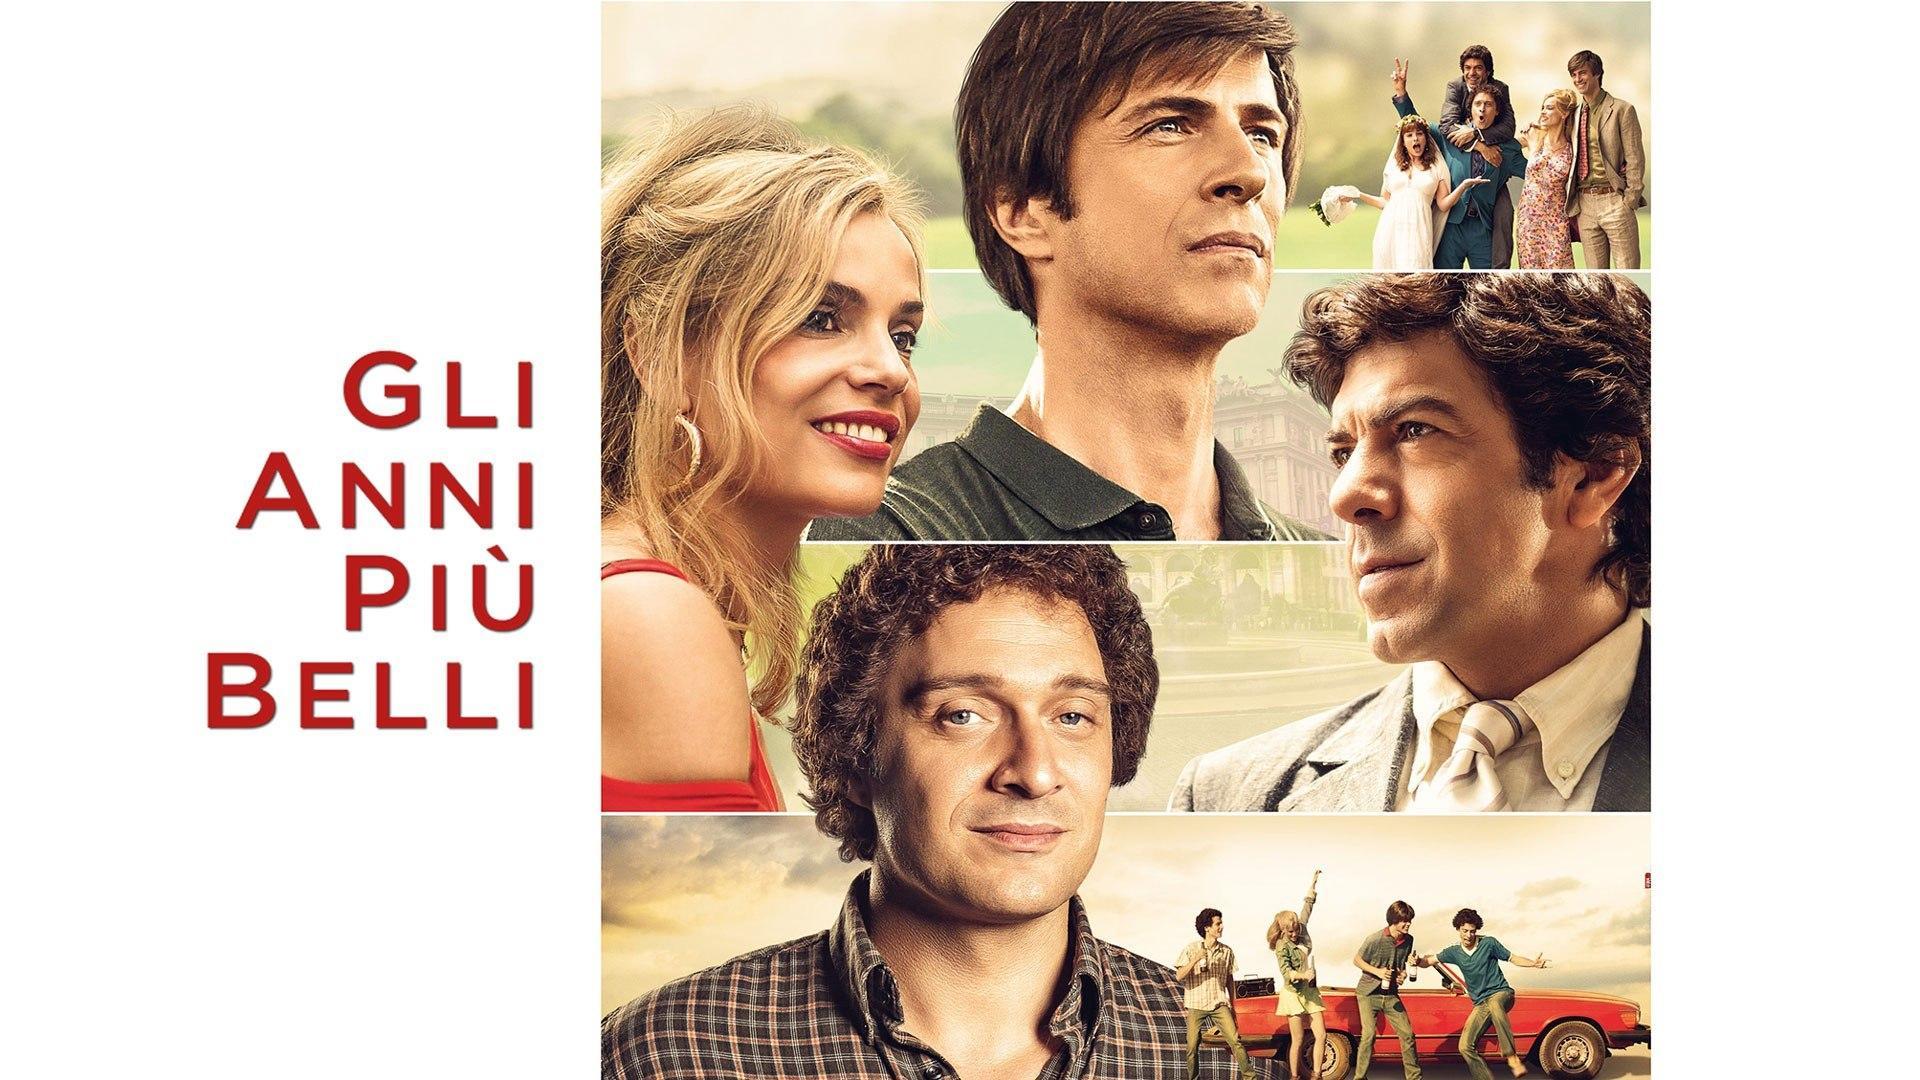 Lunedi 7 Settembre 2020 Sky Cinema HD, Gli Anni Piu Belli